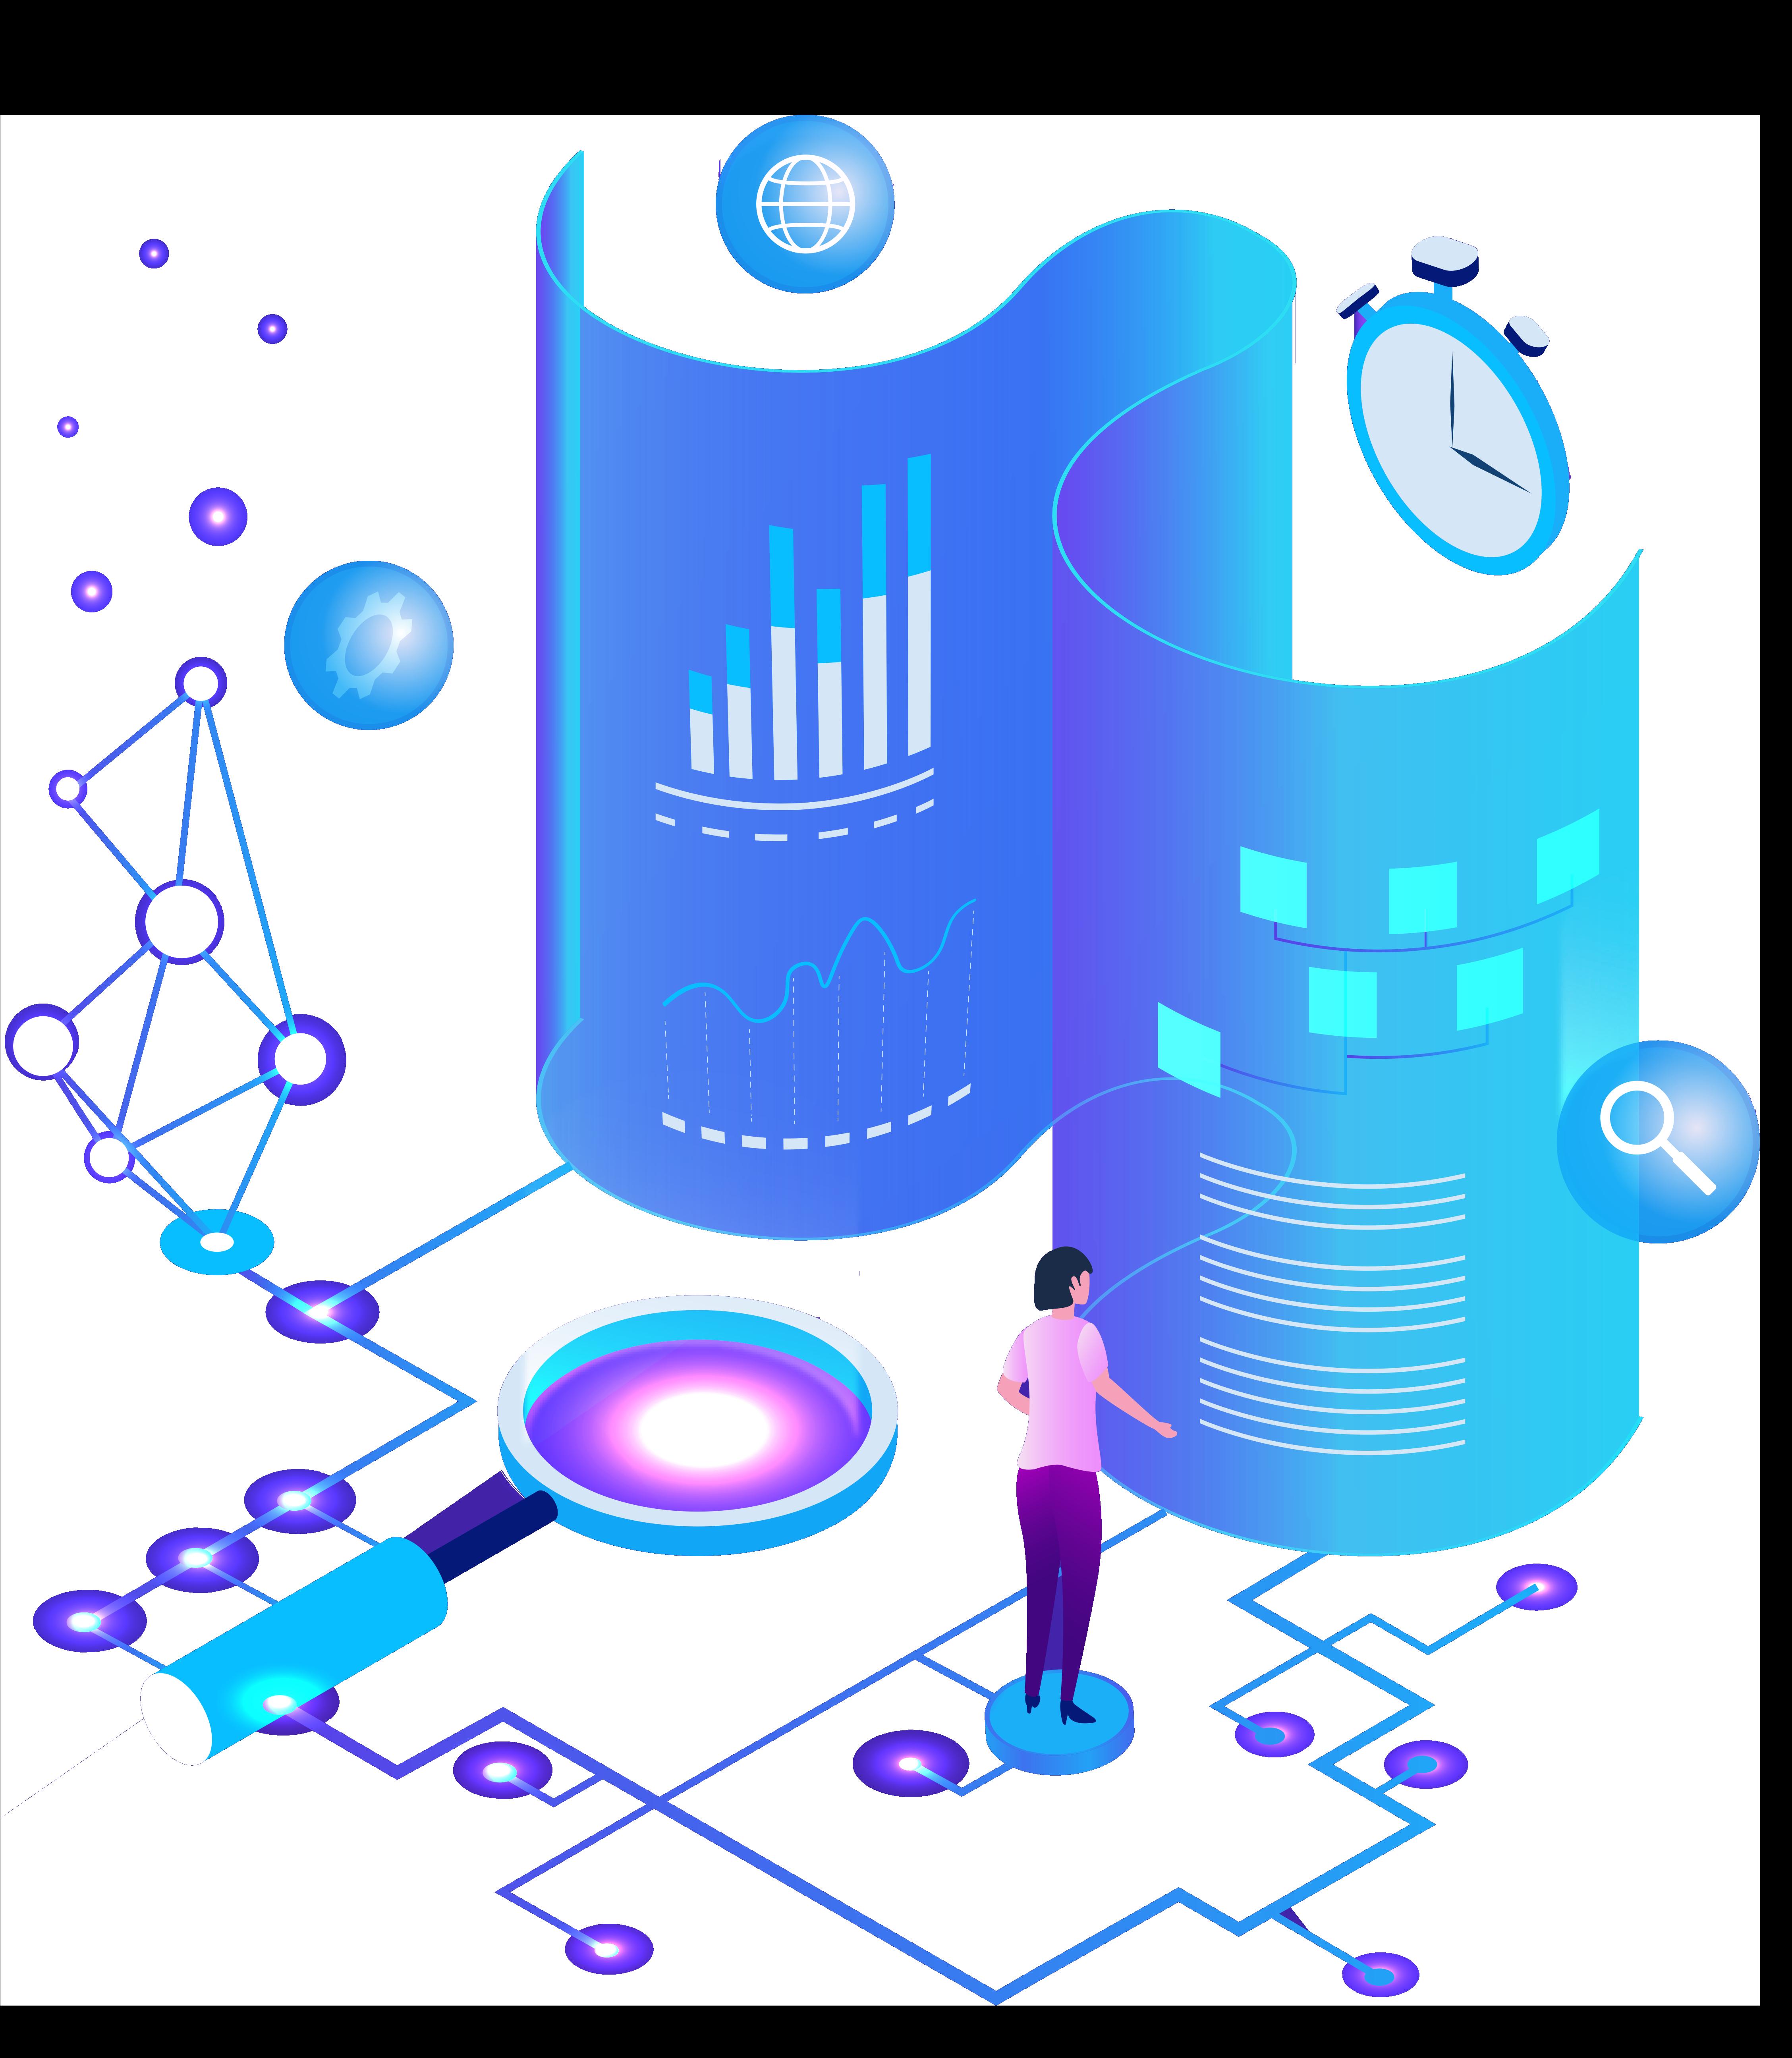 data analysis, web development